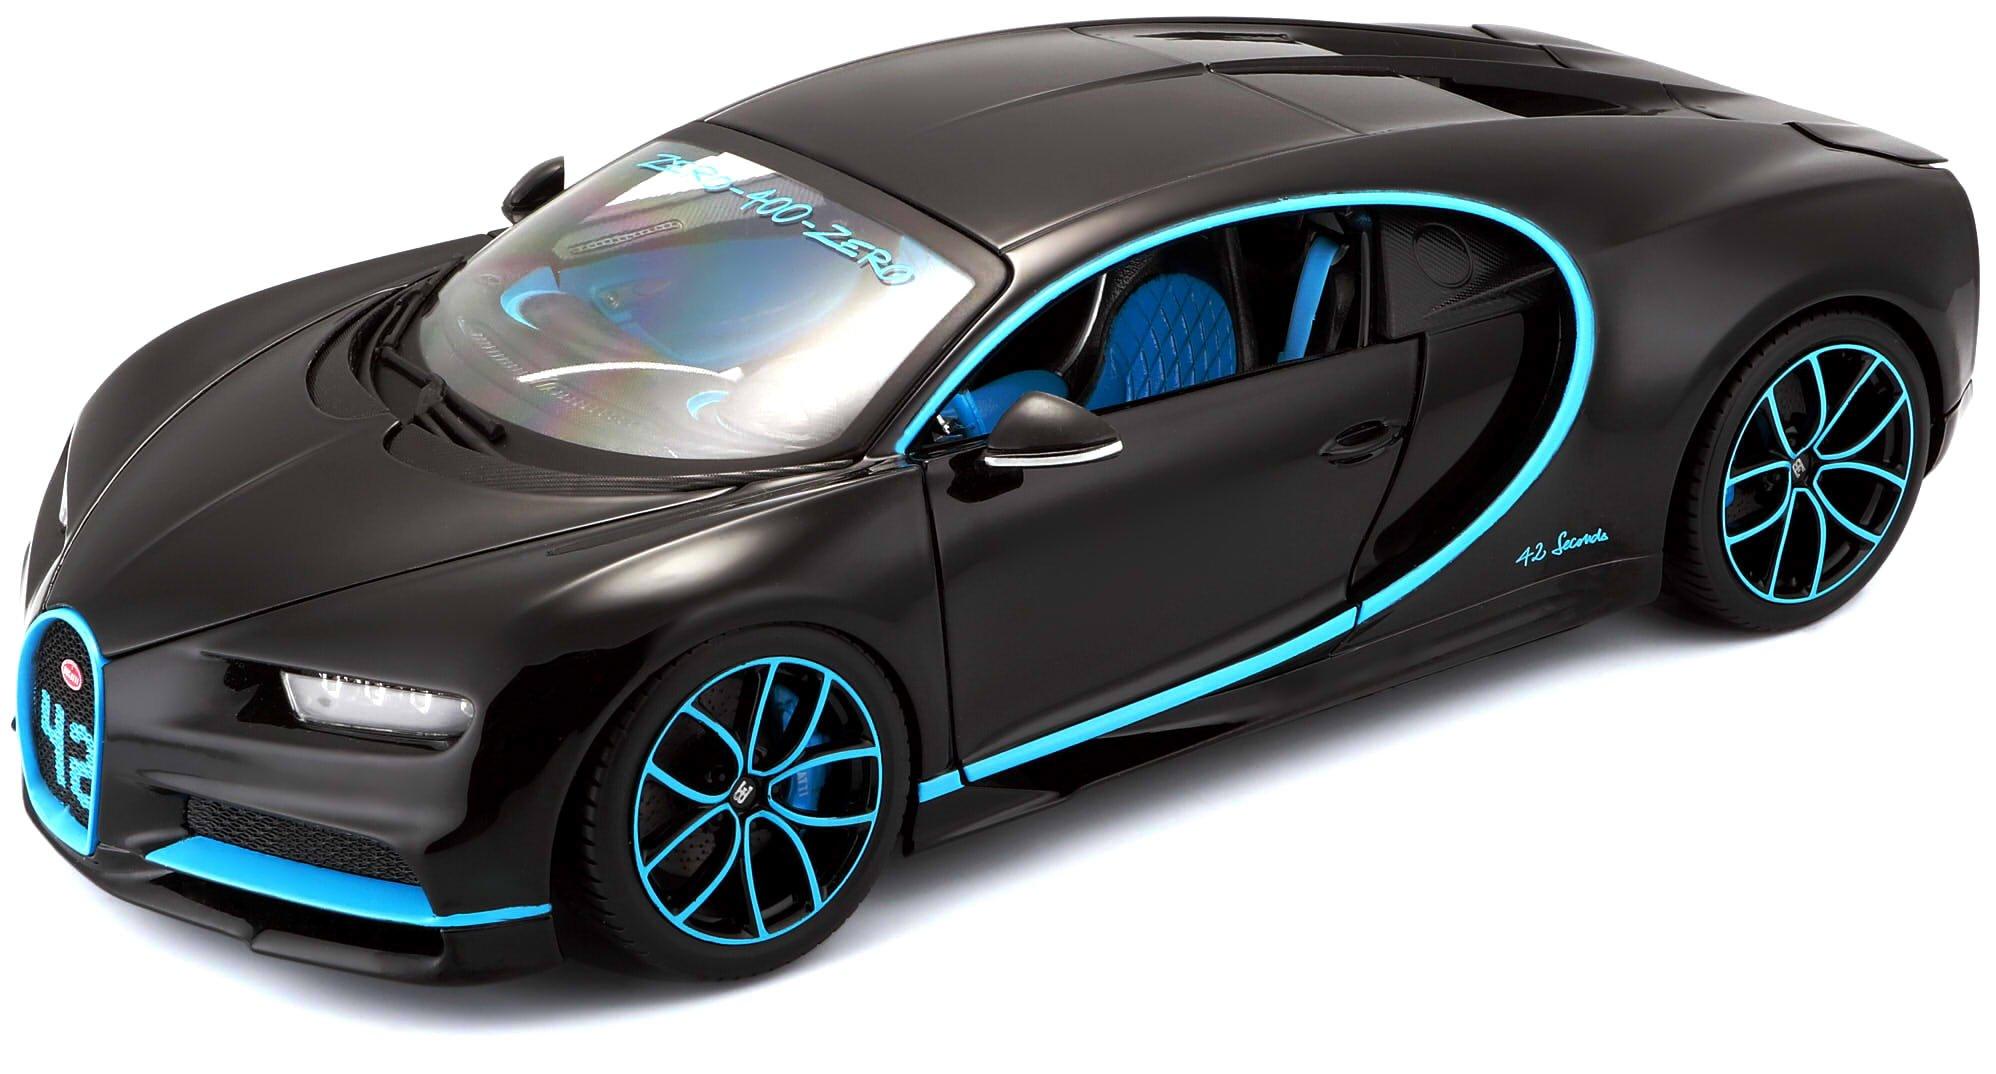 Tobar 15611040BK 1:18 Bugatti CHIRON 42 Second Special Edition, Black